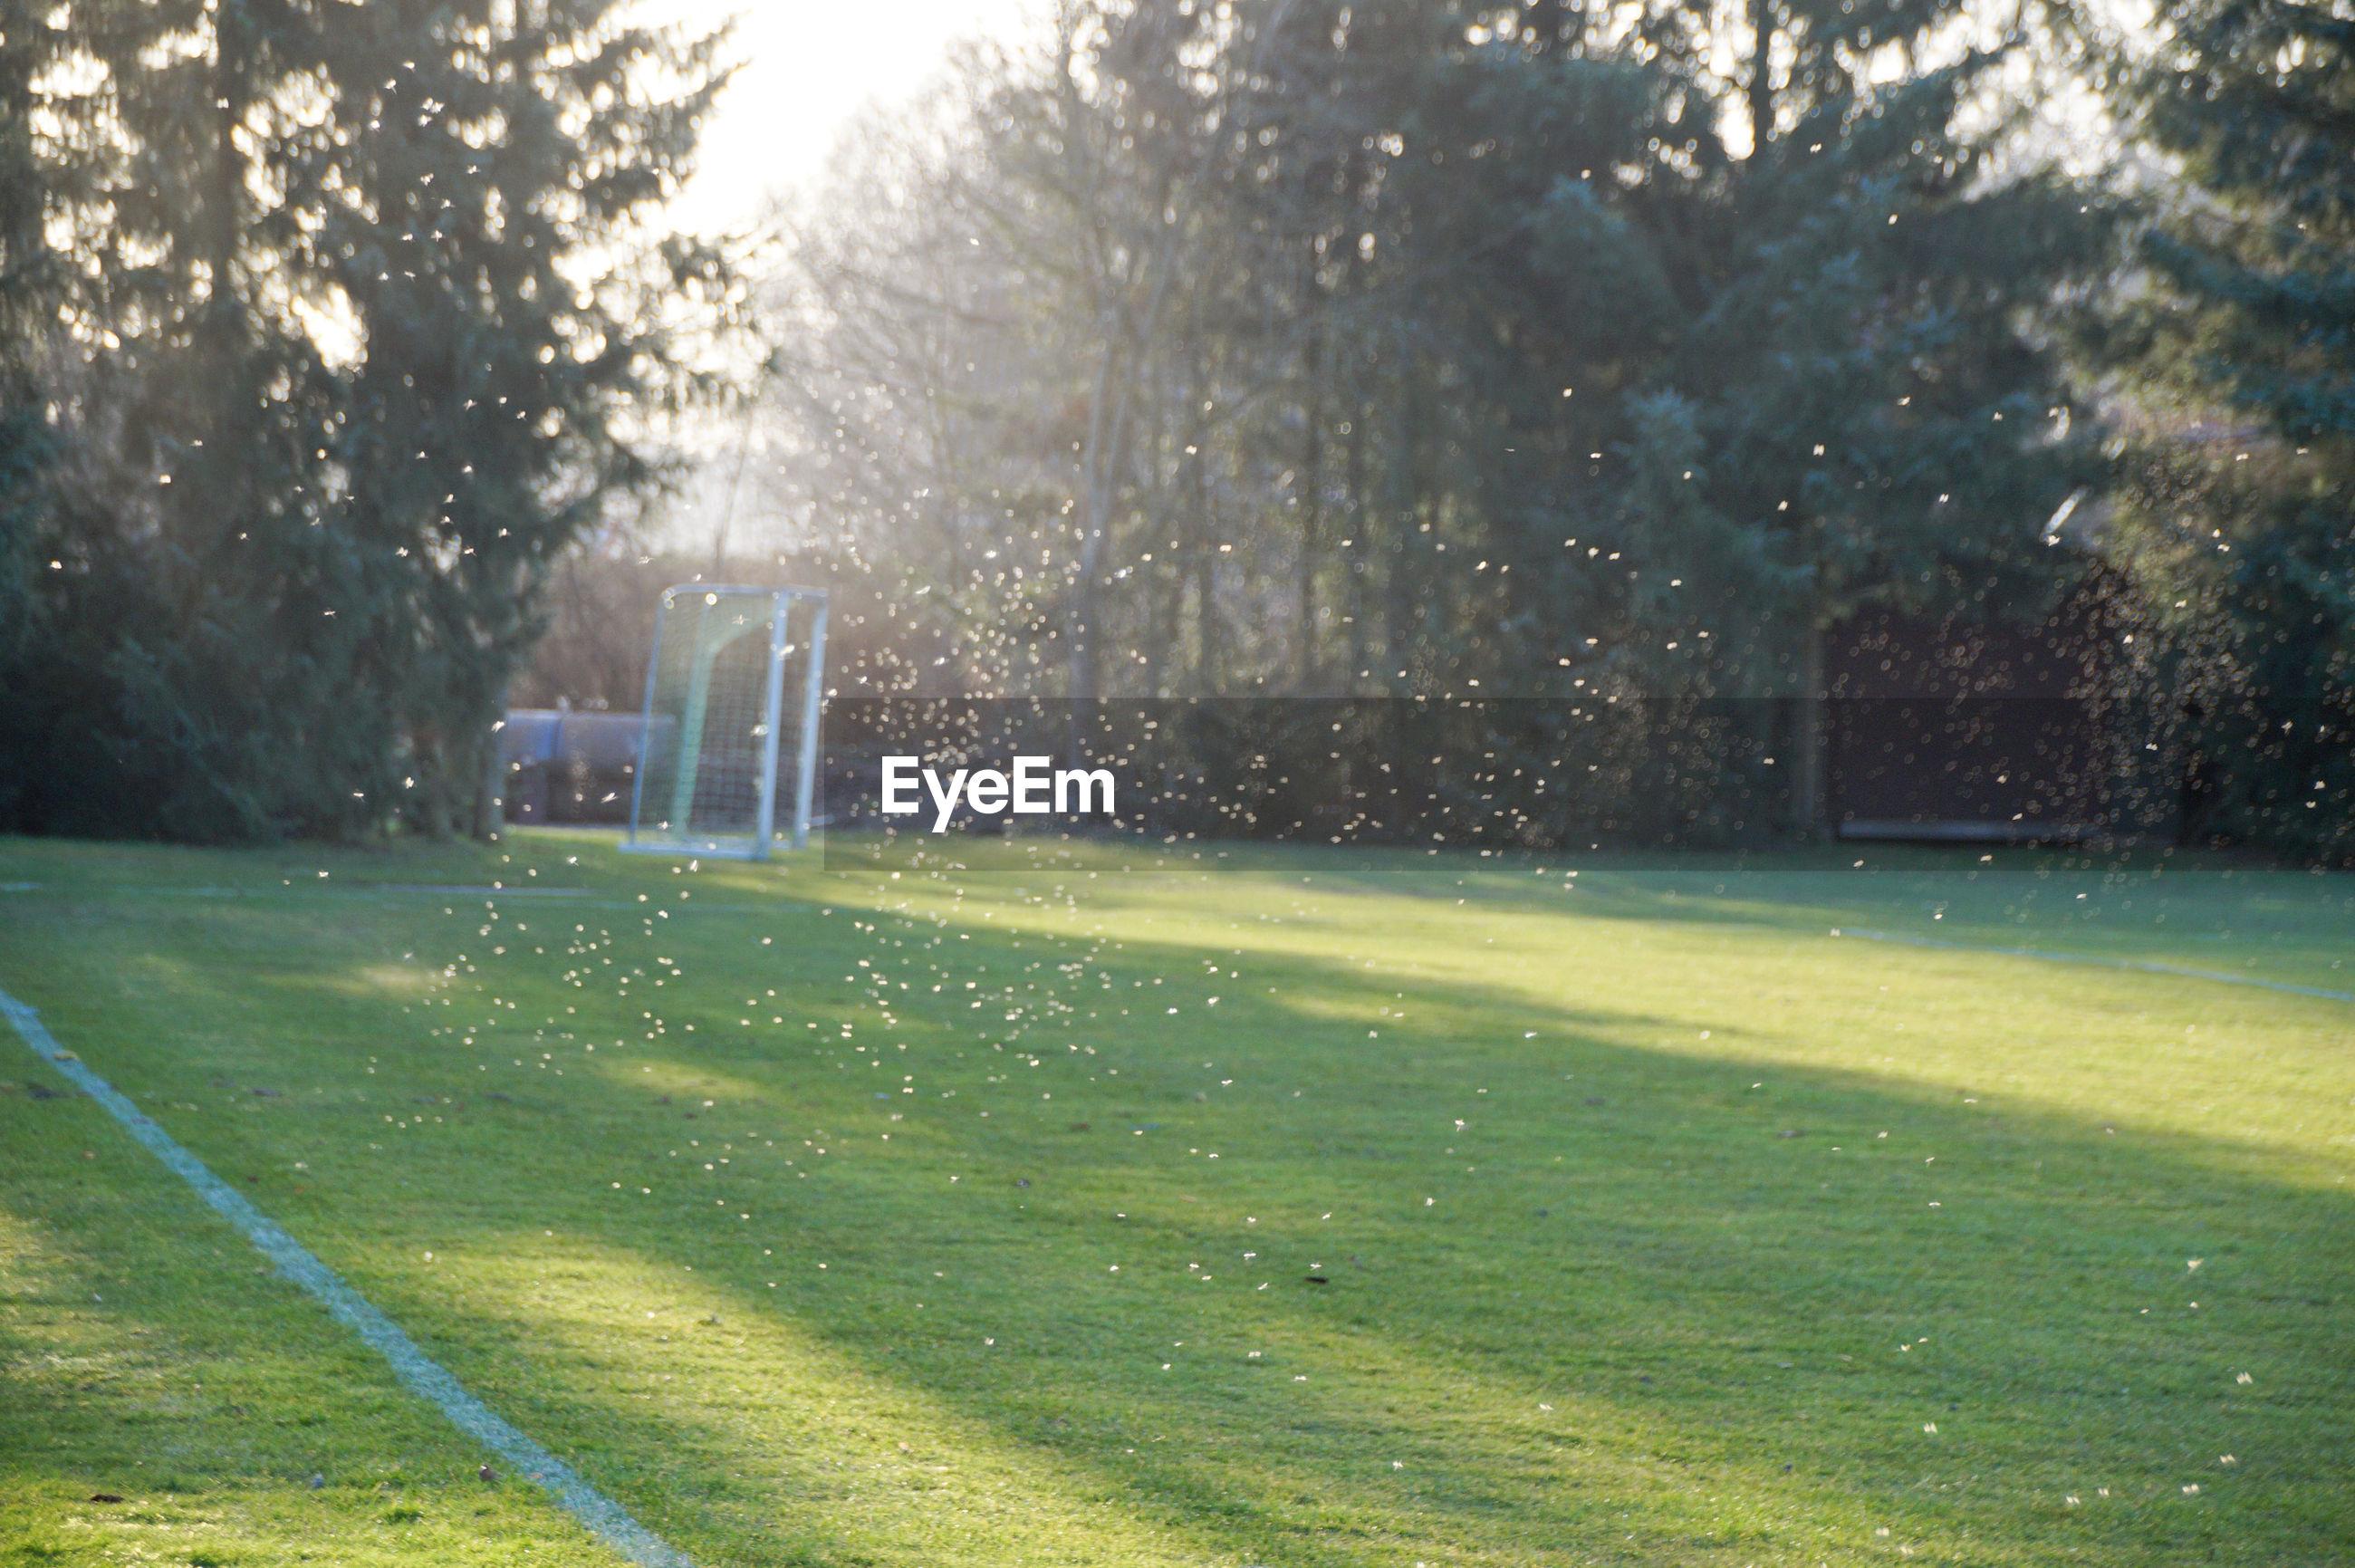 Water spraying over soccer field